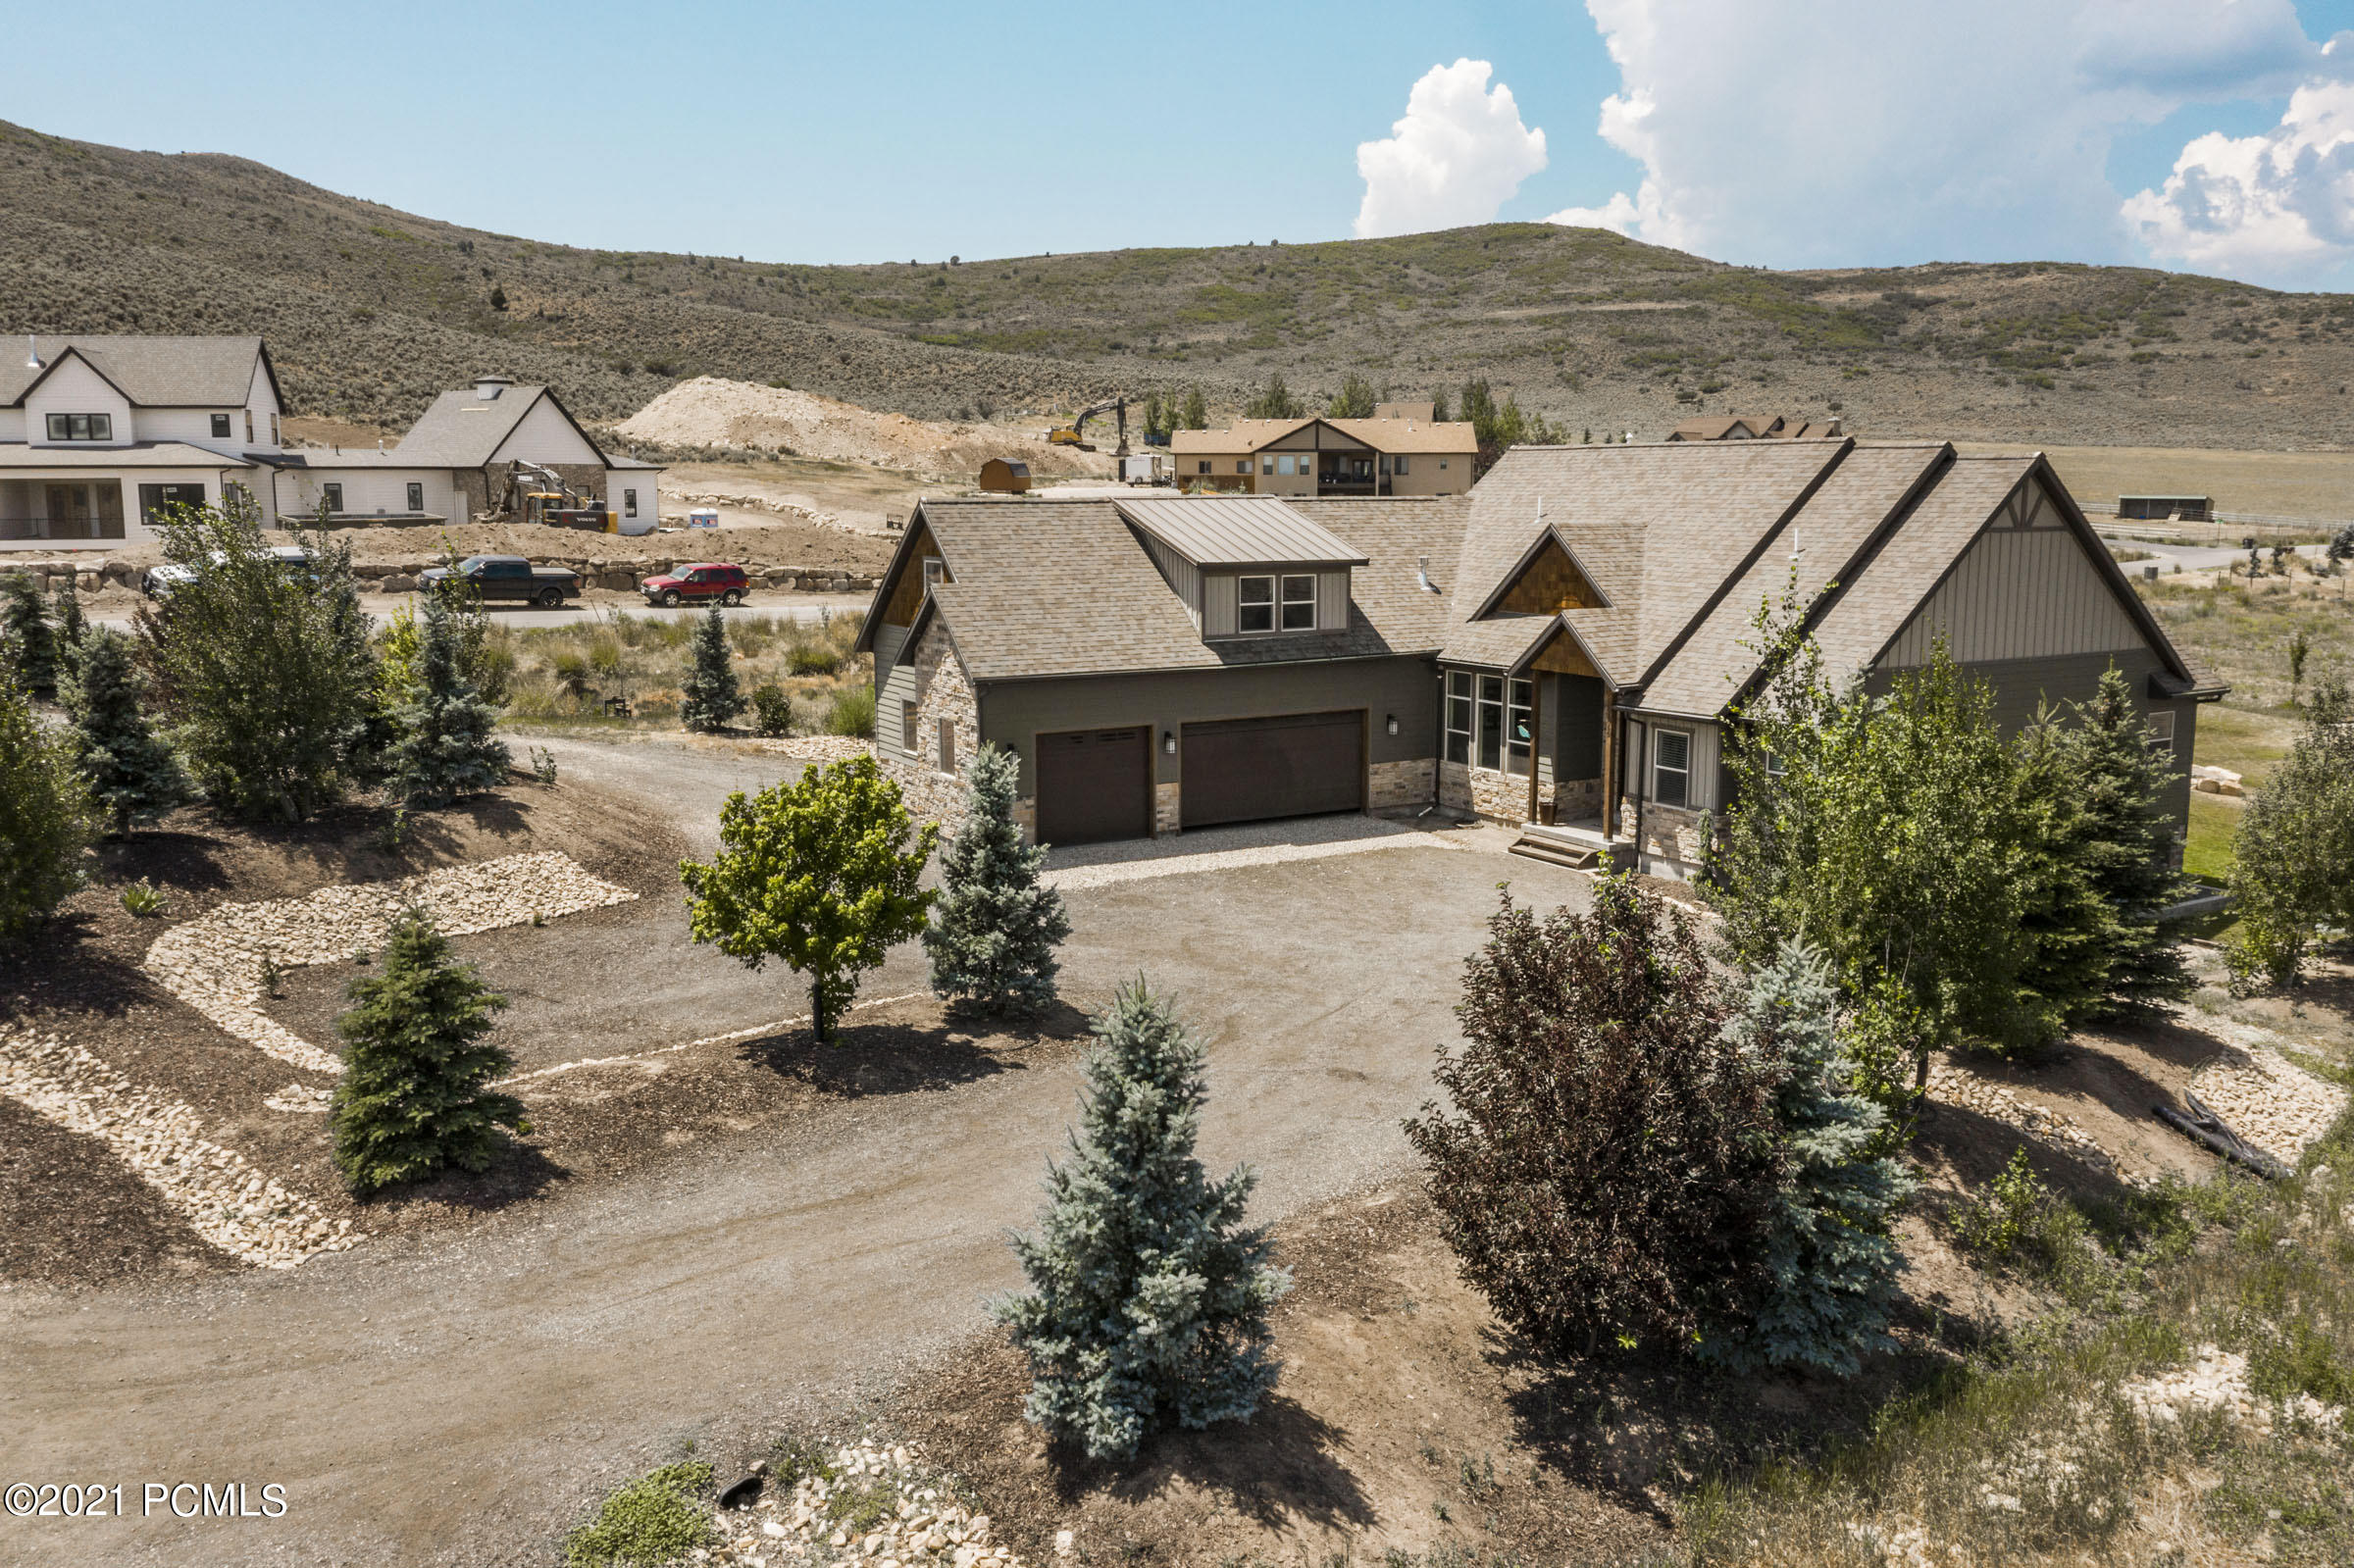 1050 Rusty Circle, Kamas, Utah 84036, 4 Bedrooms Bedrooms, ,2 BathroomsBathrooms,Single Family,For Sale,Rusty Circle,12103343